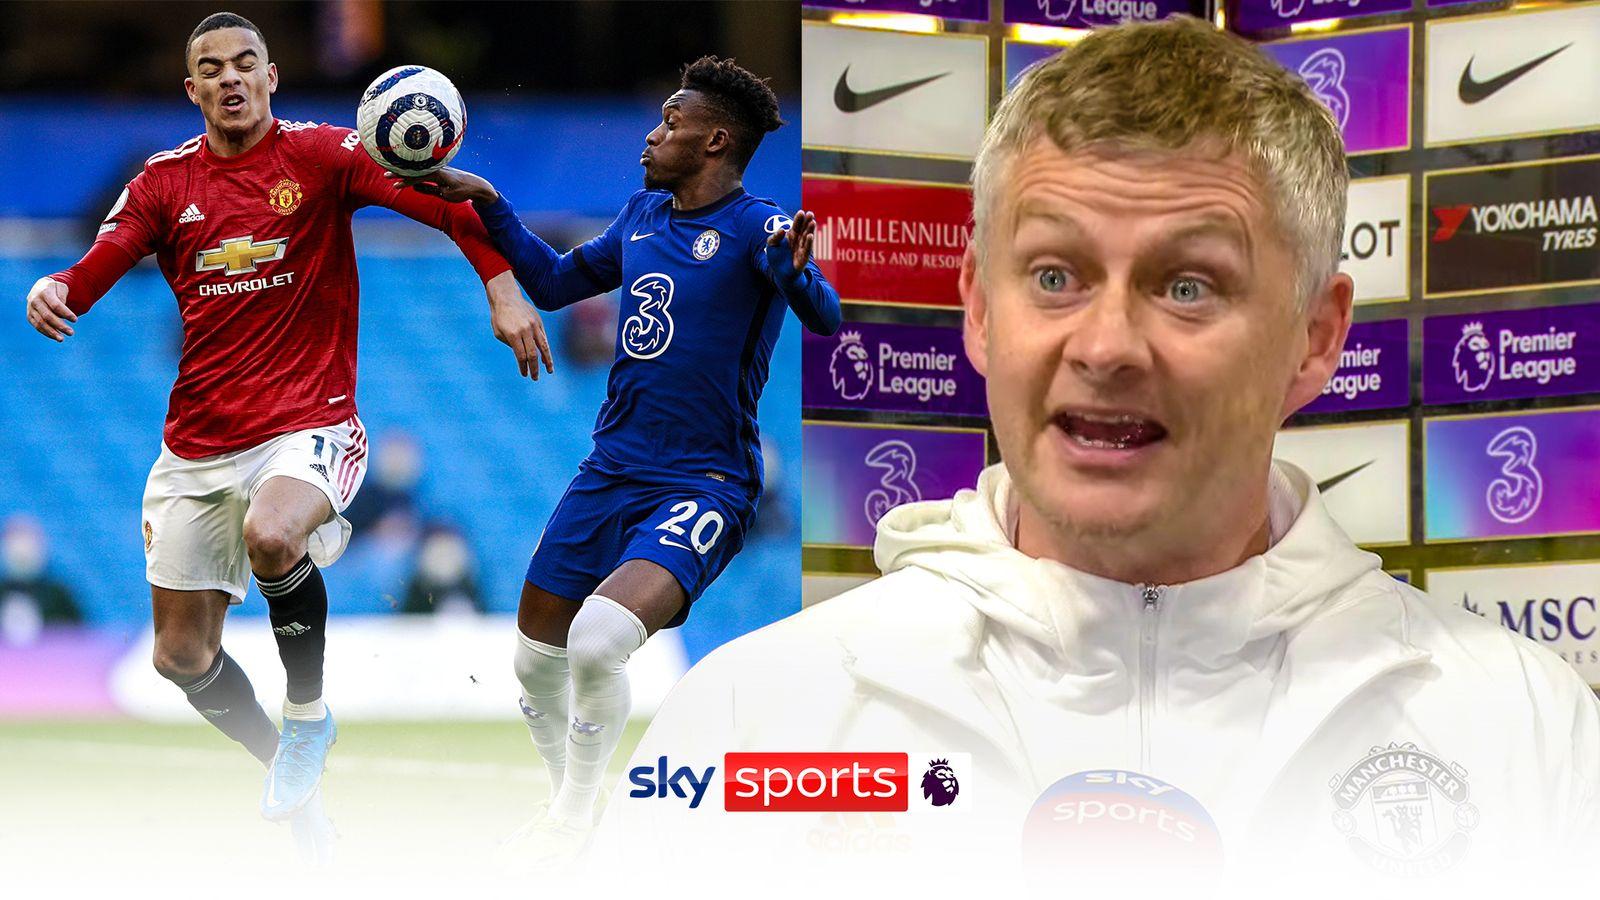 Man Utd boss Ole Gunnar Solskjaer fumes at Callum Hudson-Odoi penalty decision, VAR, and Chelsea 'influencing' referees